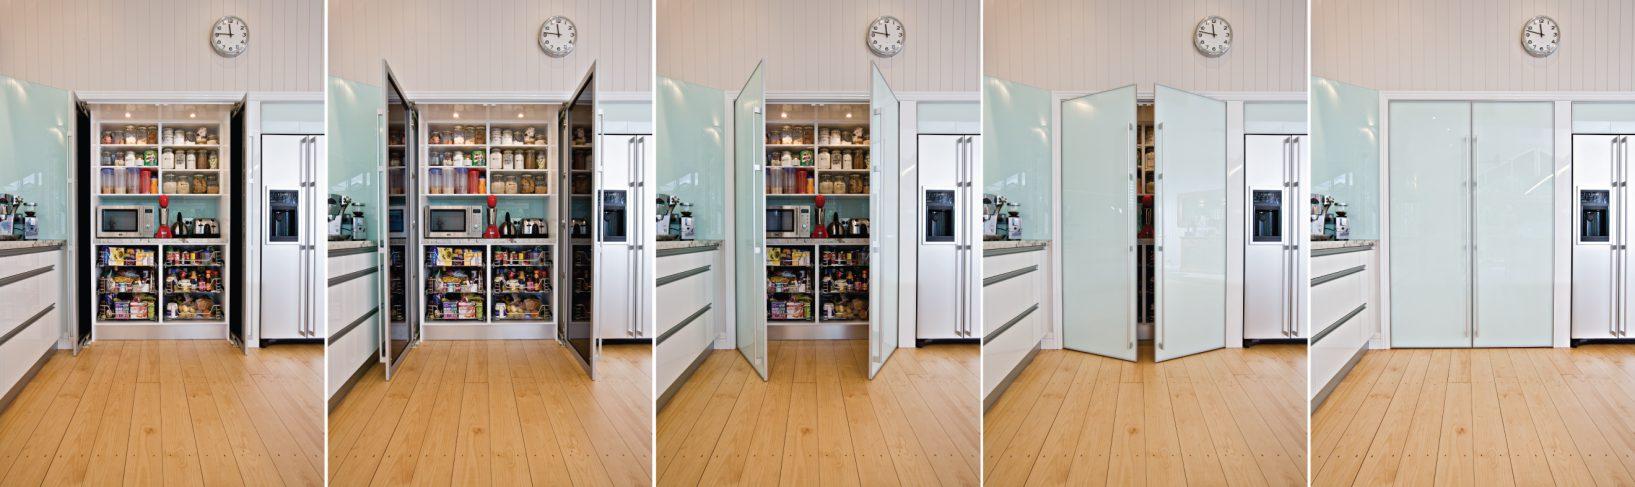 Pocket Folding Sliding Pantry Doors